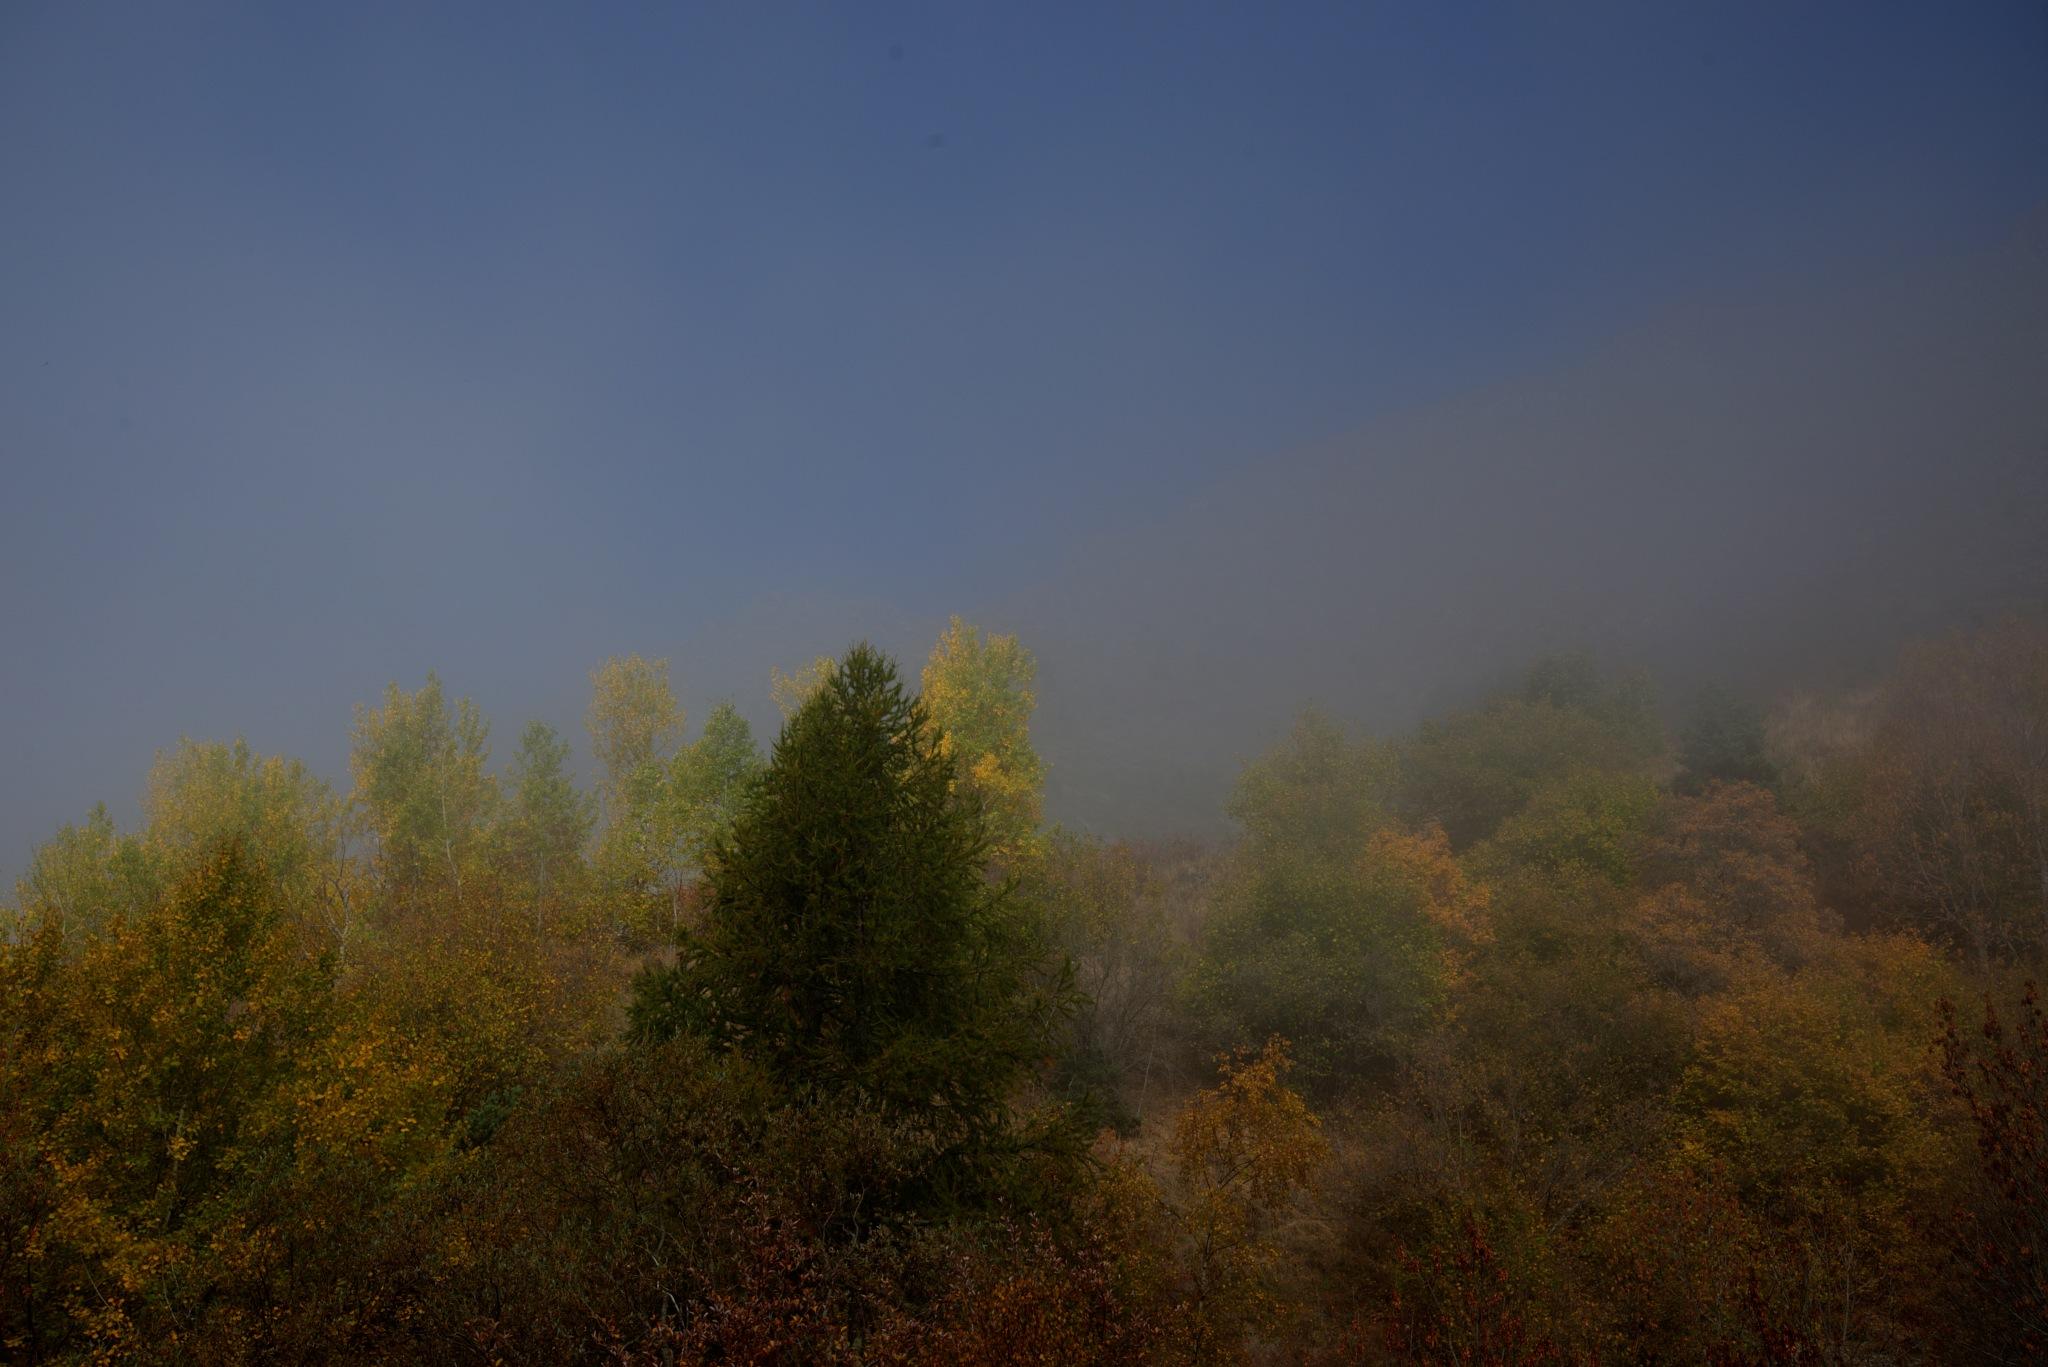 Limite de la brume by bernardf142